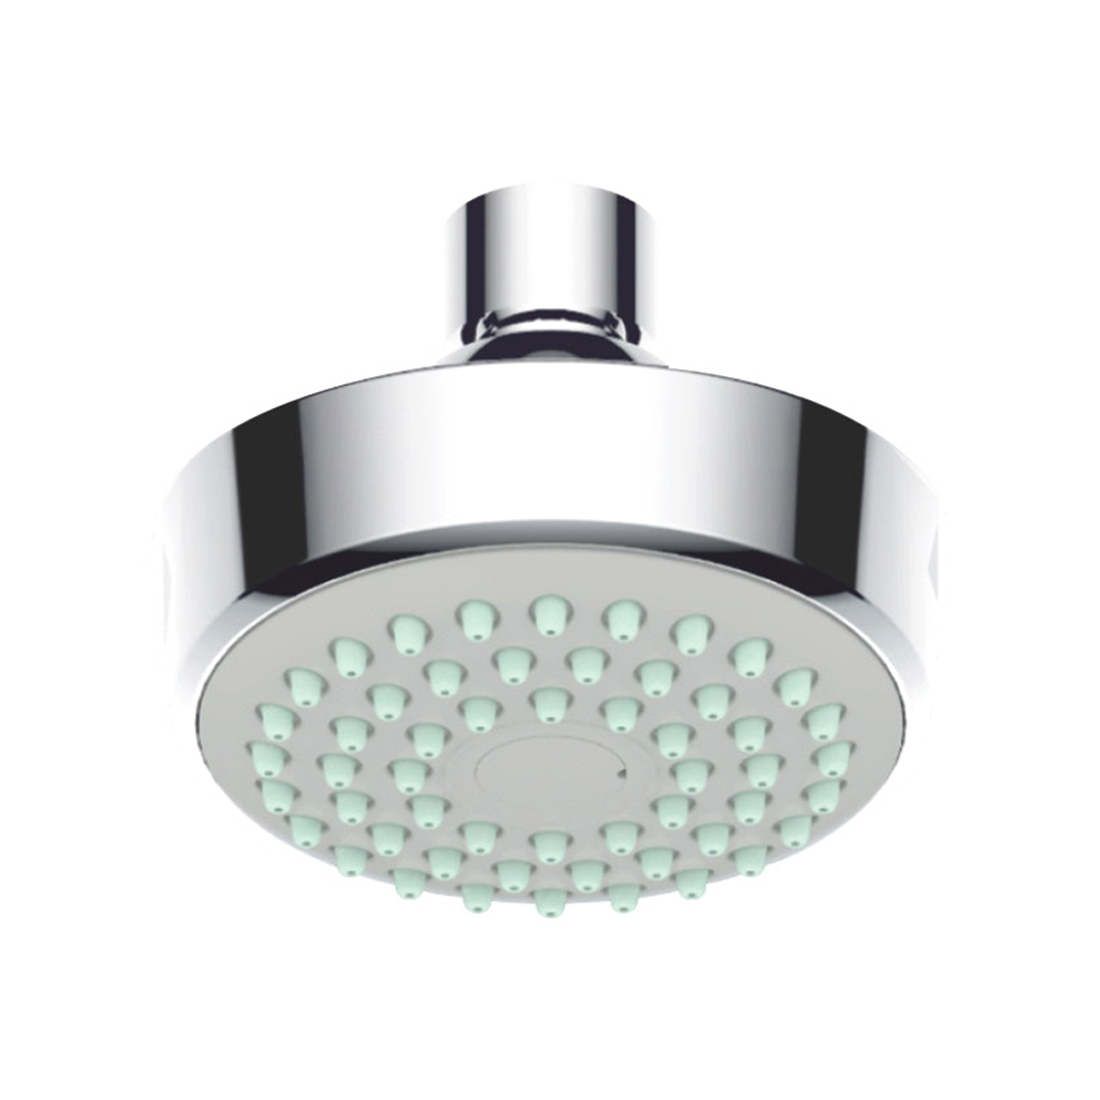 Kerovit KA550003 Single Function Overhead Shower